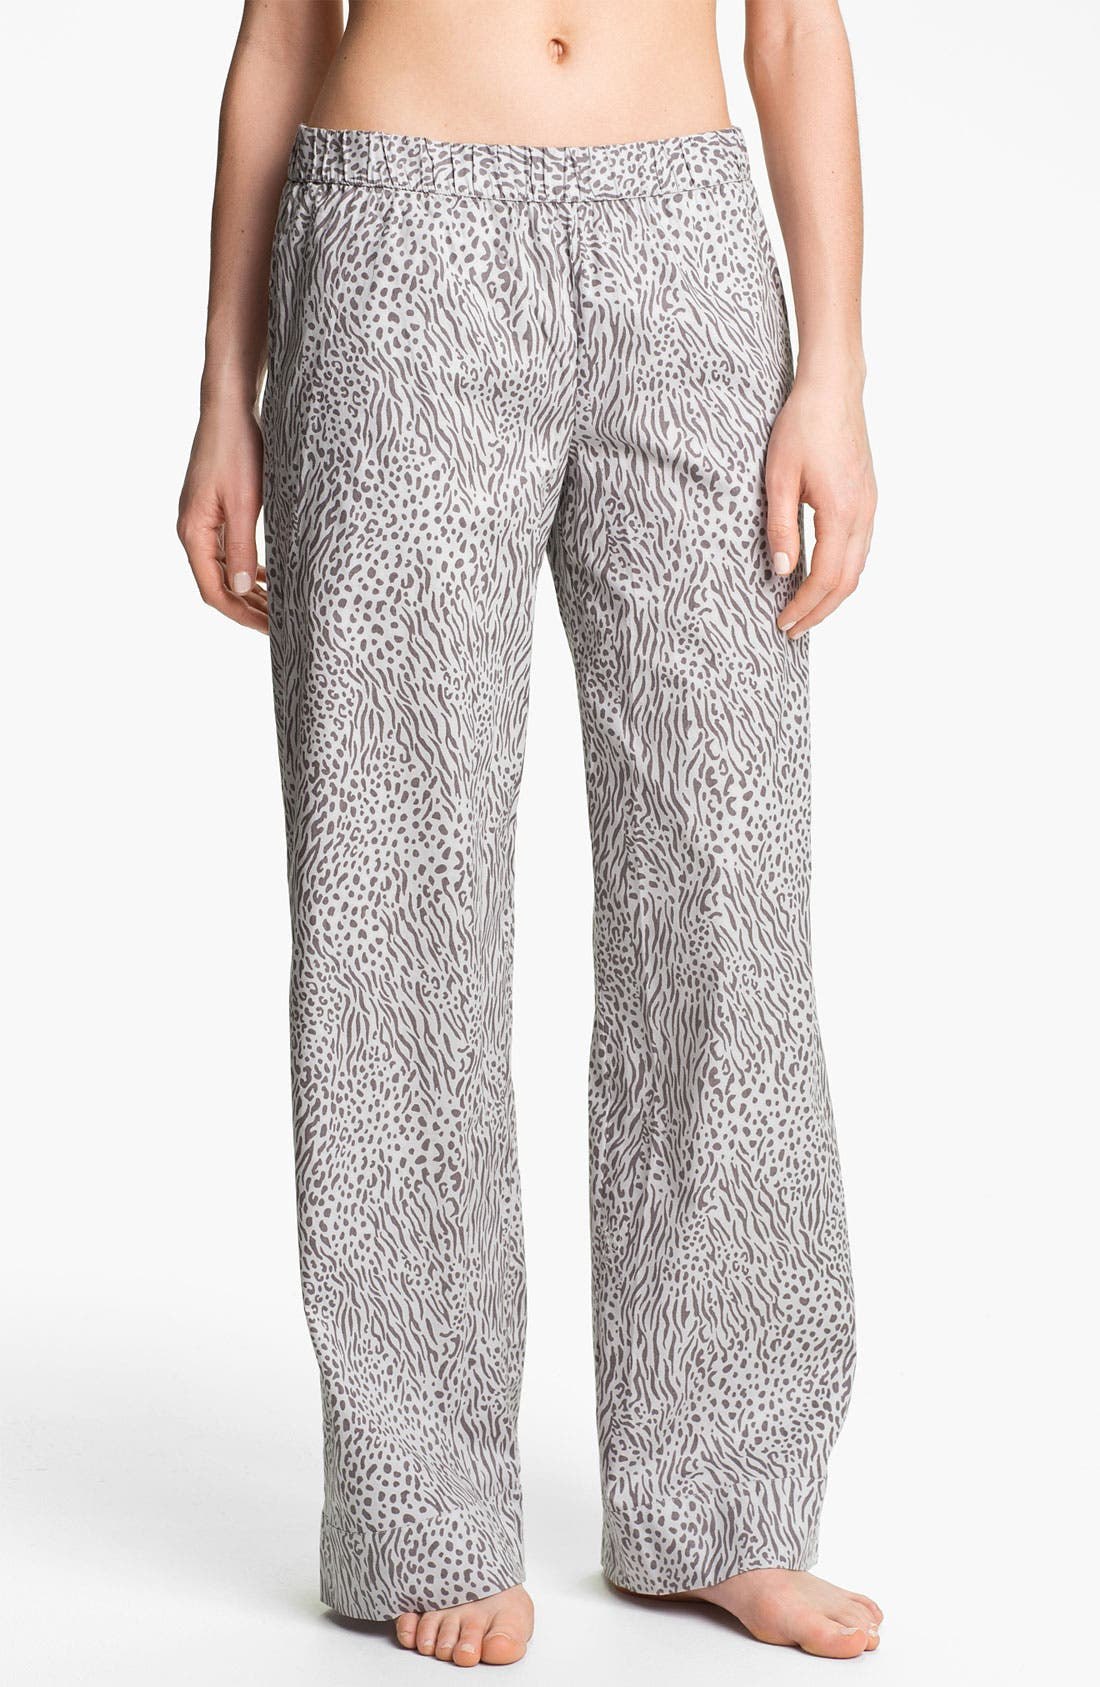 Alternate Image 1 Selected - Shimera Print Lounge Pants